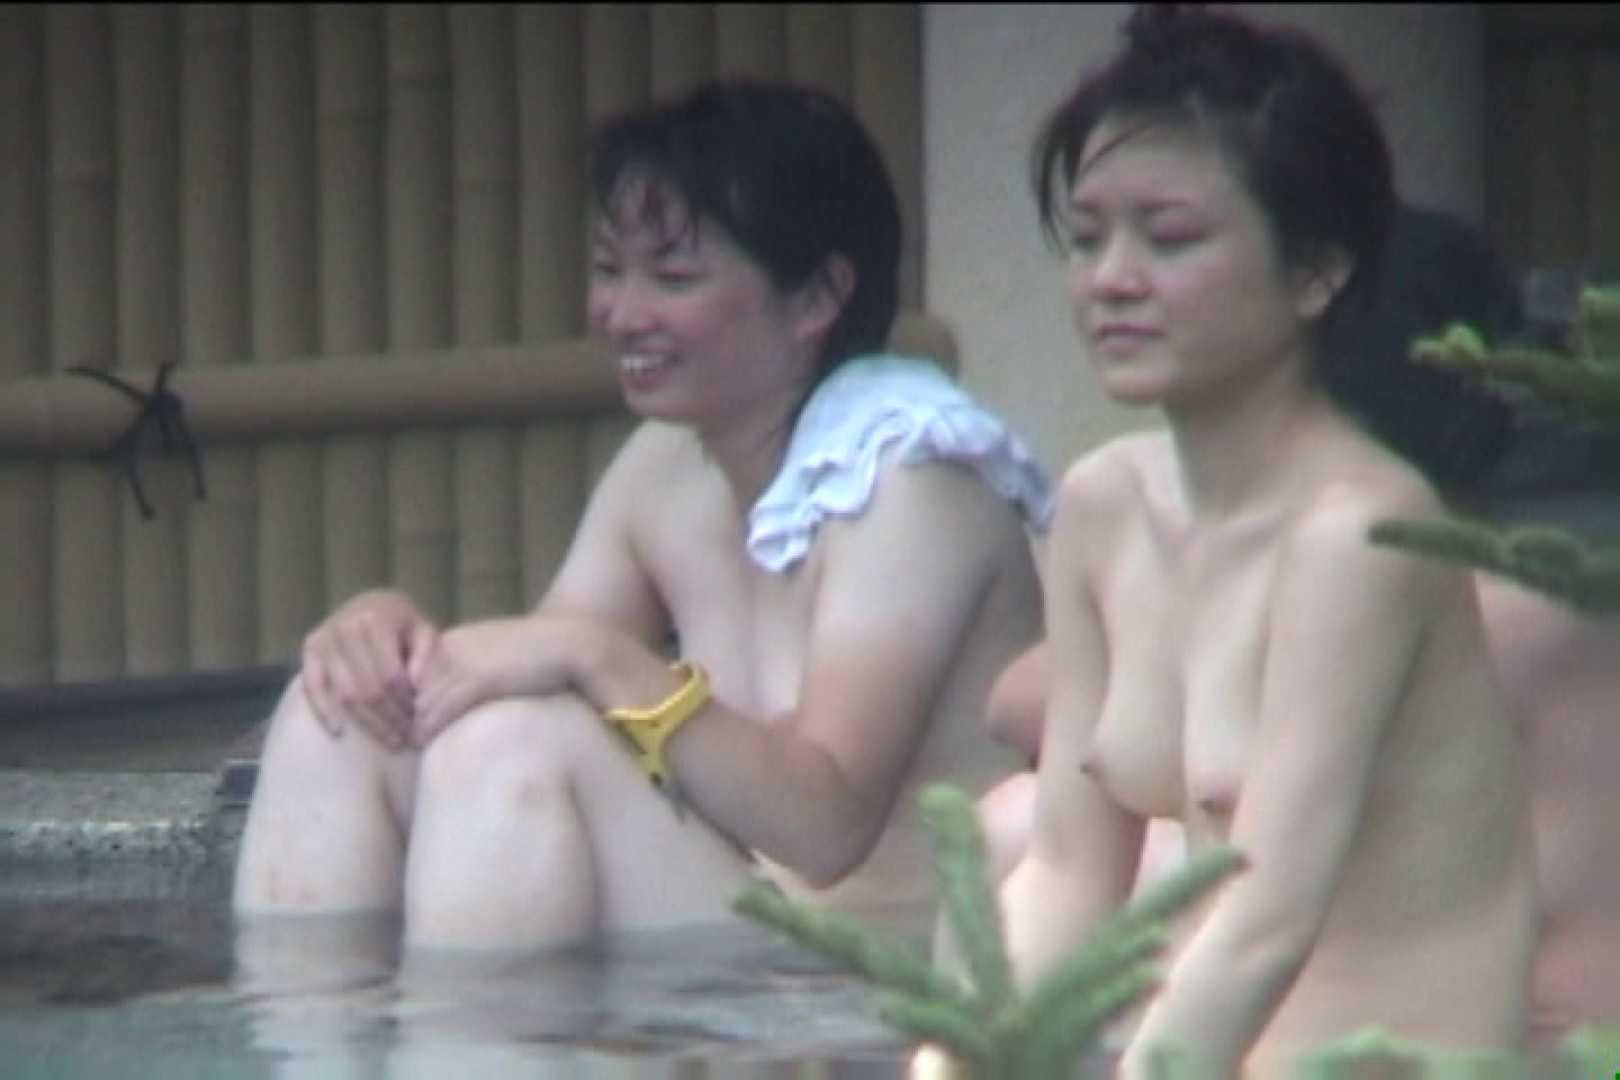 Aquaな露天風呂Vol.94【VIP限定】 OLセックス 盗撮エロ画像 79画像 2